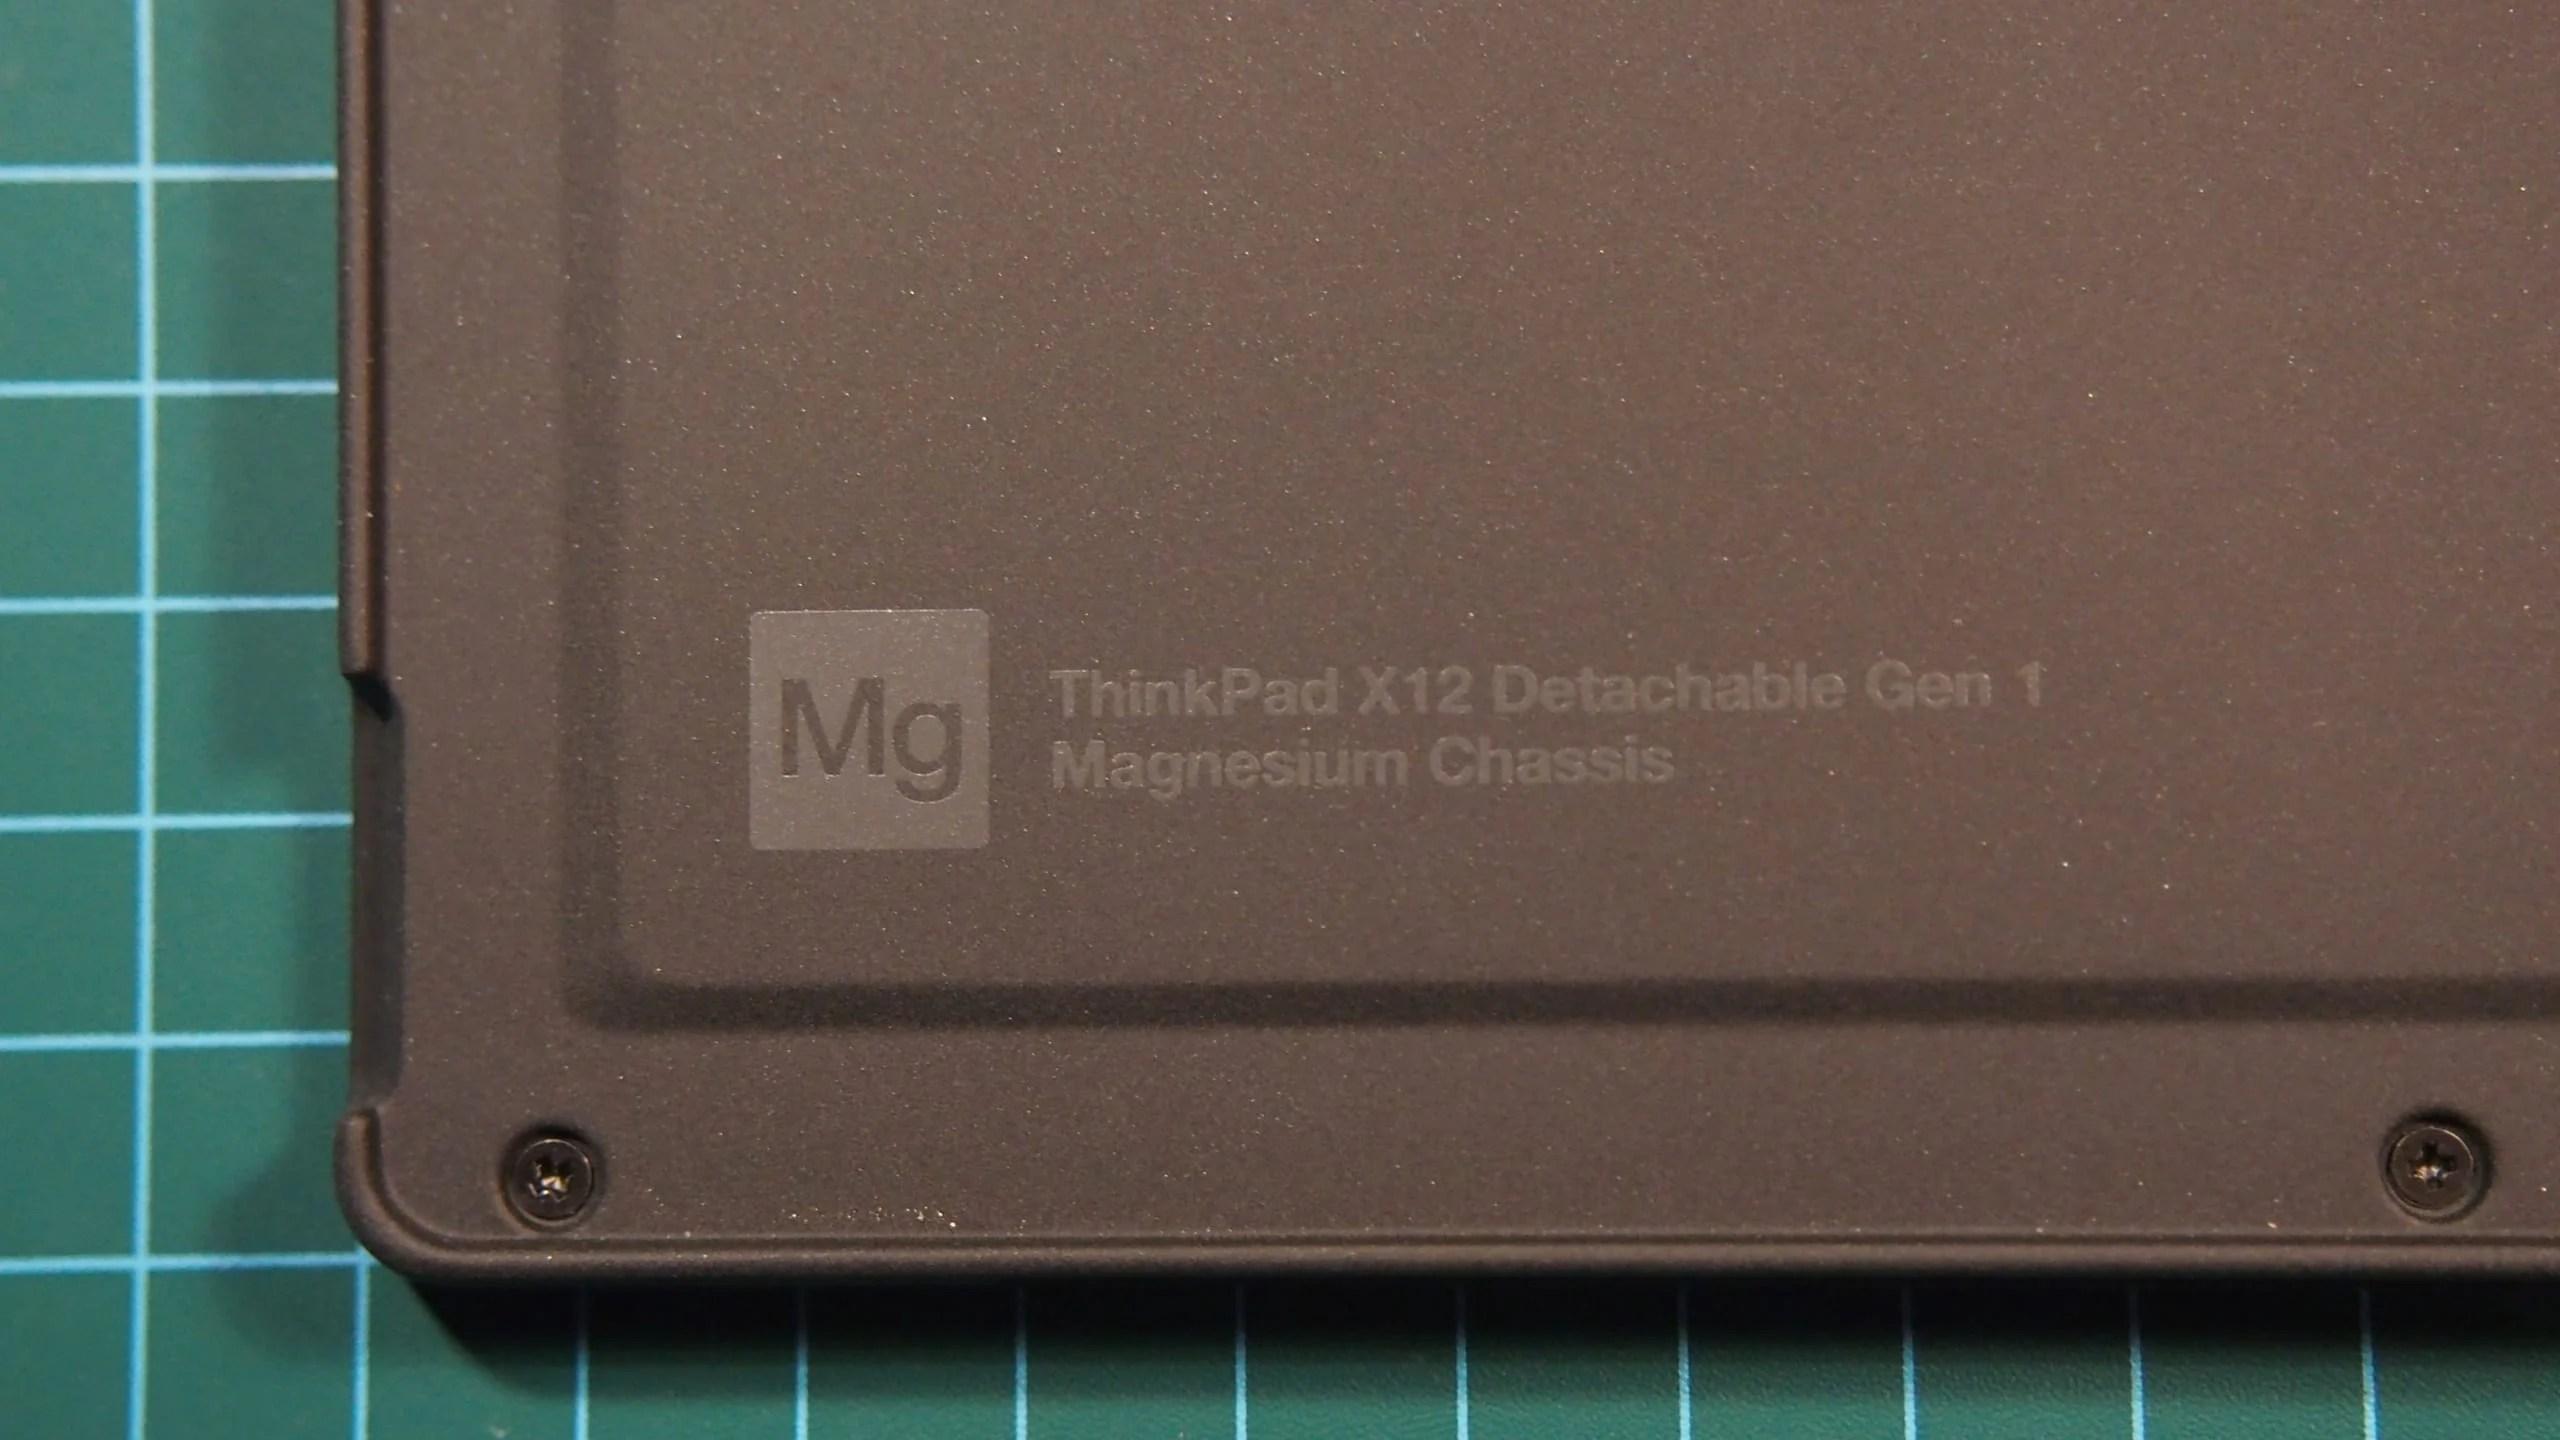 ThinkPad X12 Detachable עם גוף מגנזיום